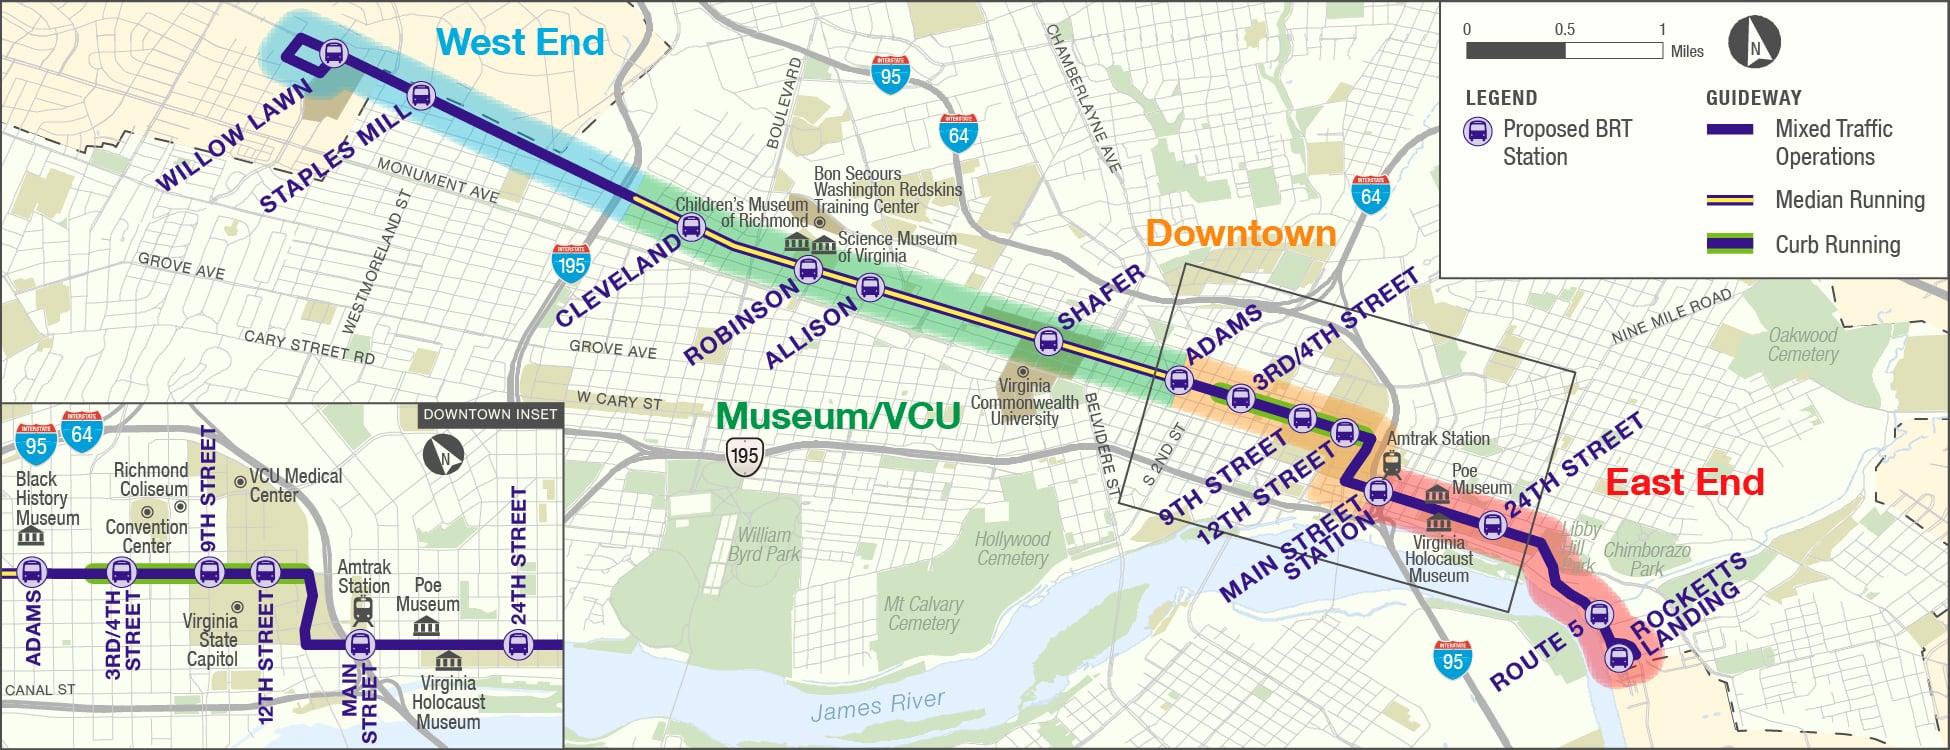 GRTC-BRT-Map-Version7-sections_-_Copy-1.jpg